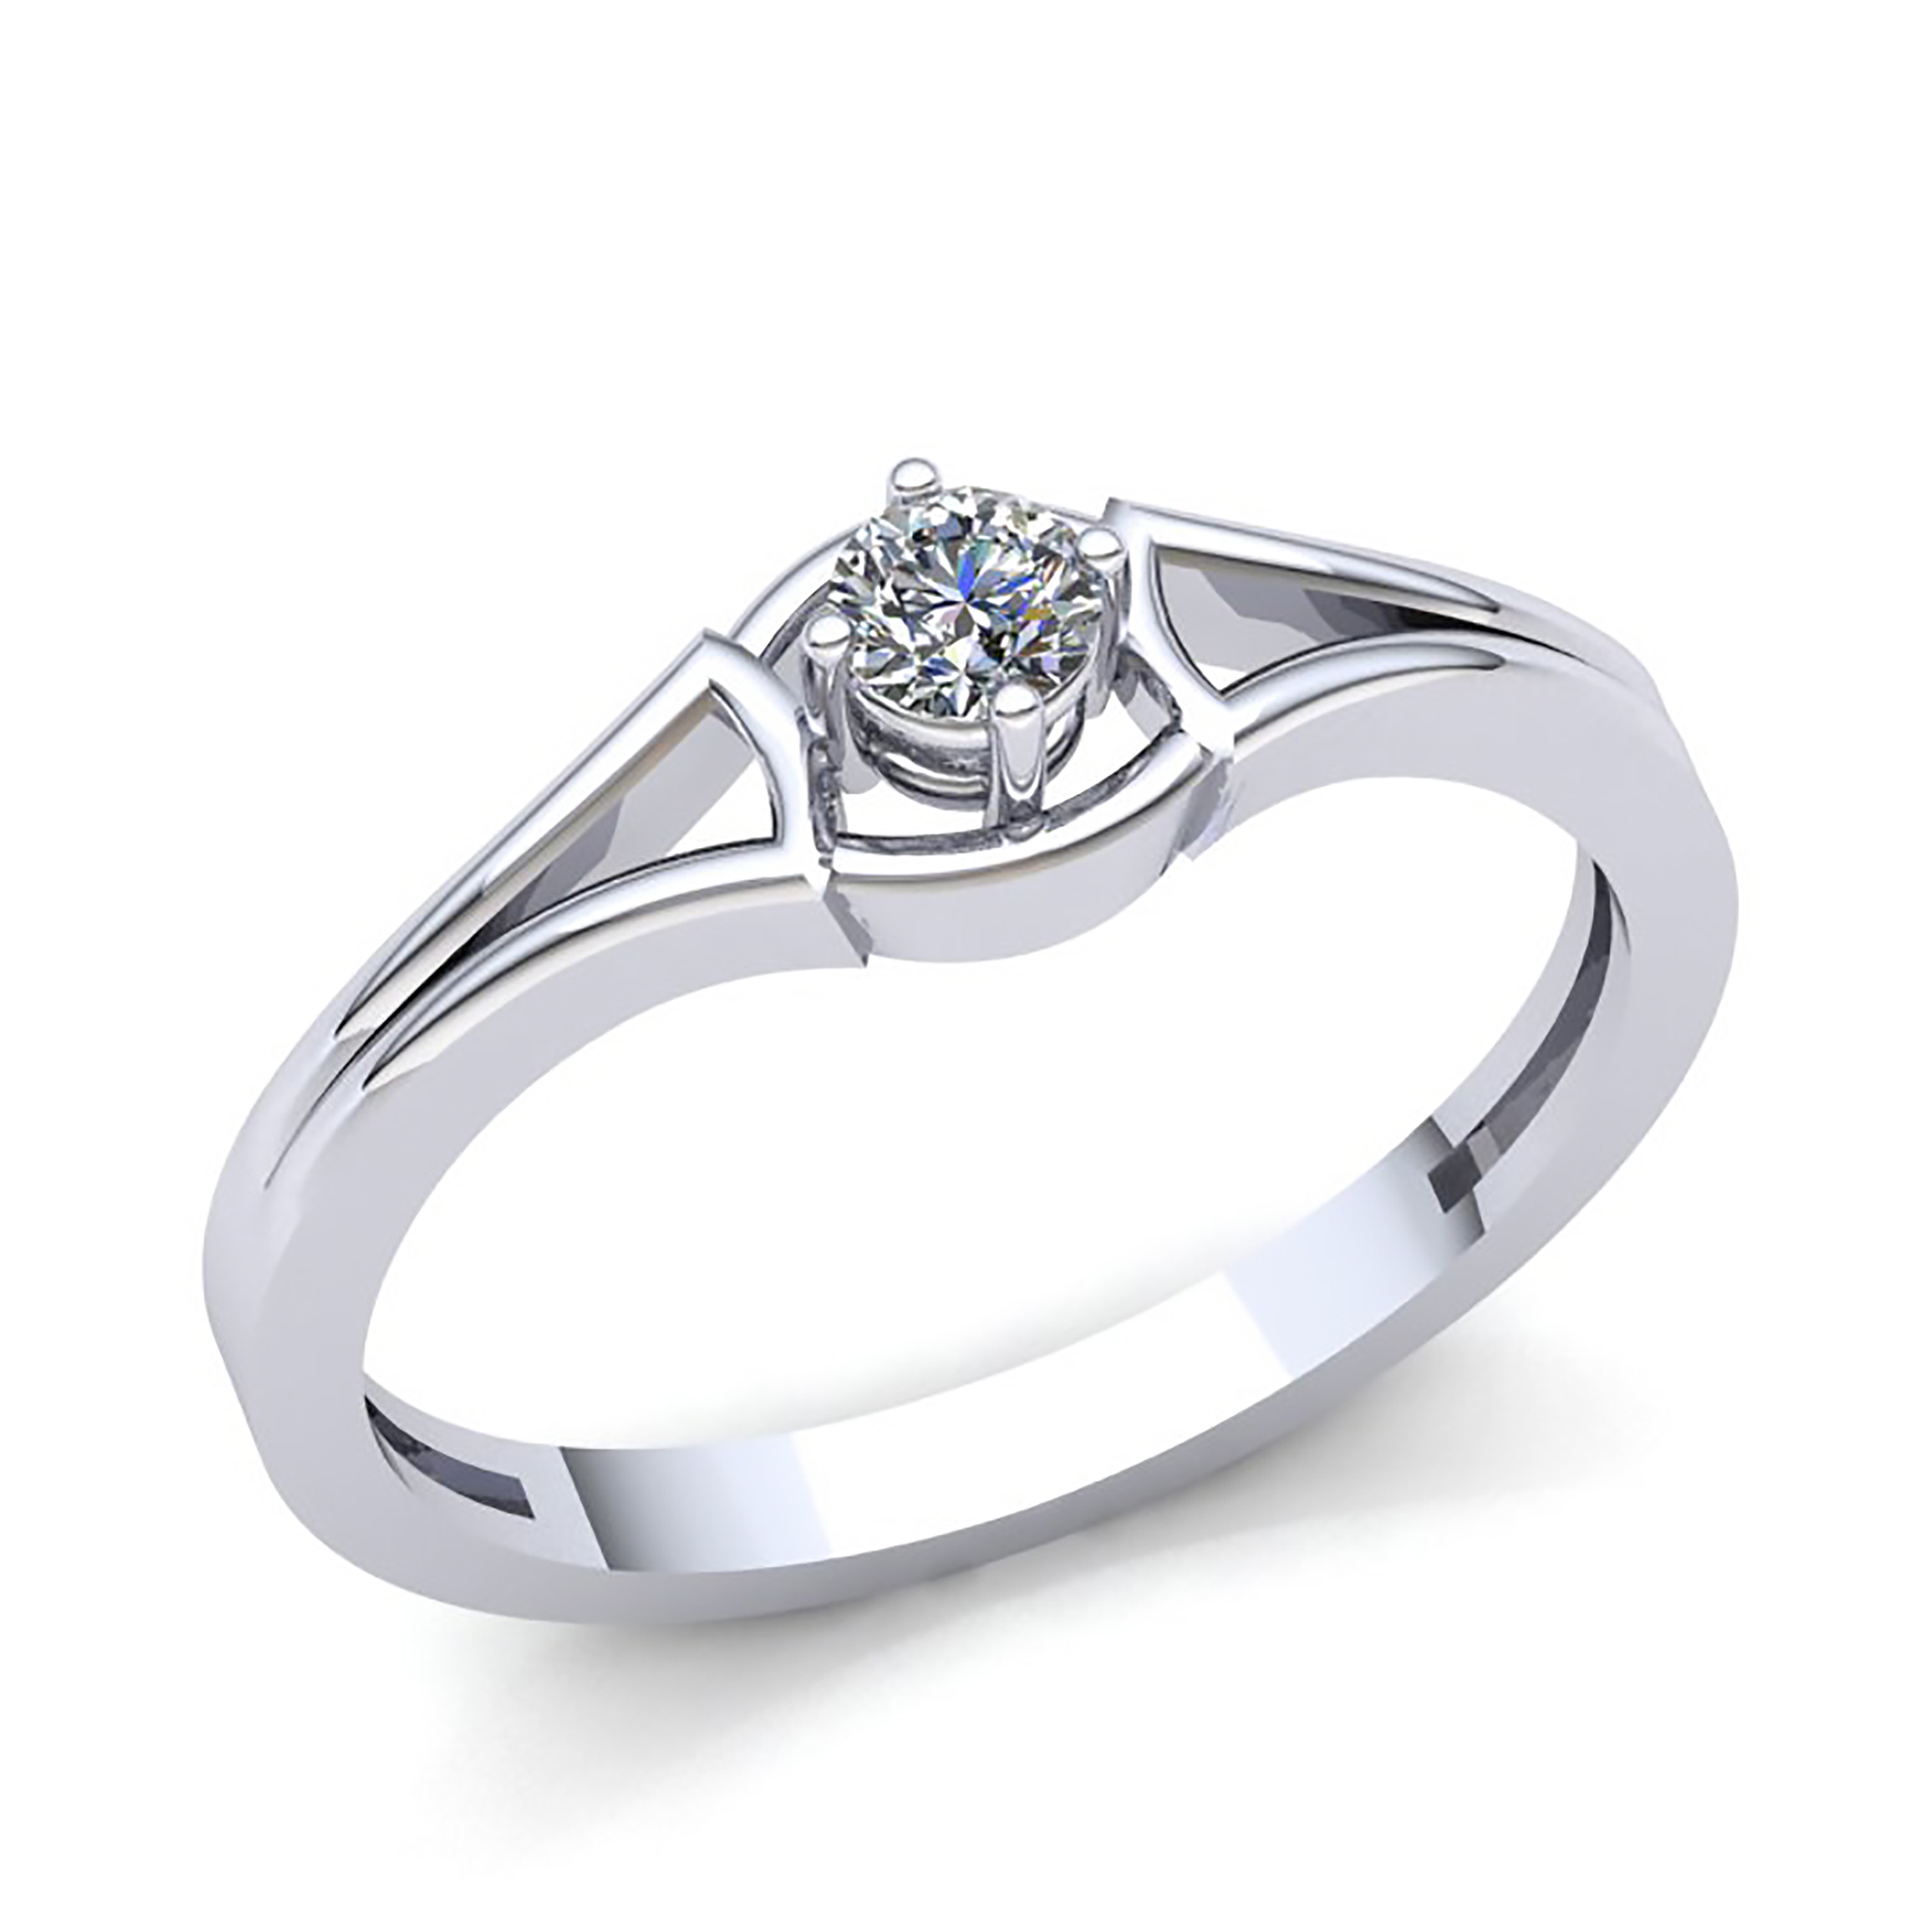 Genuine 1 4ct Round Diamond Ladies Bridal Solitaire Engagement Ring 18K gold